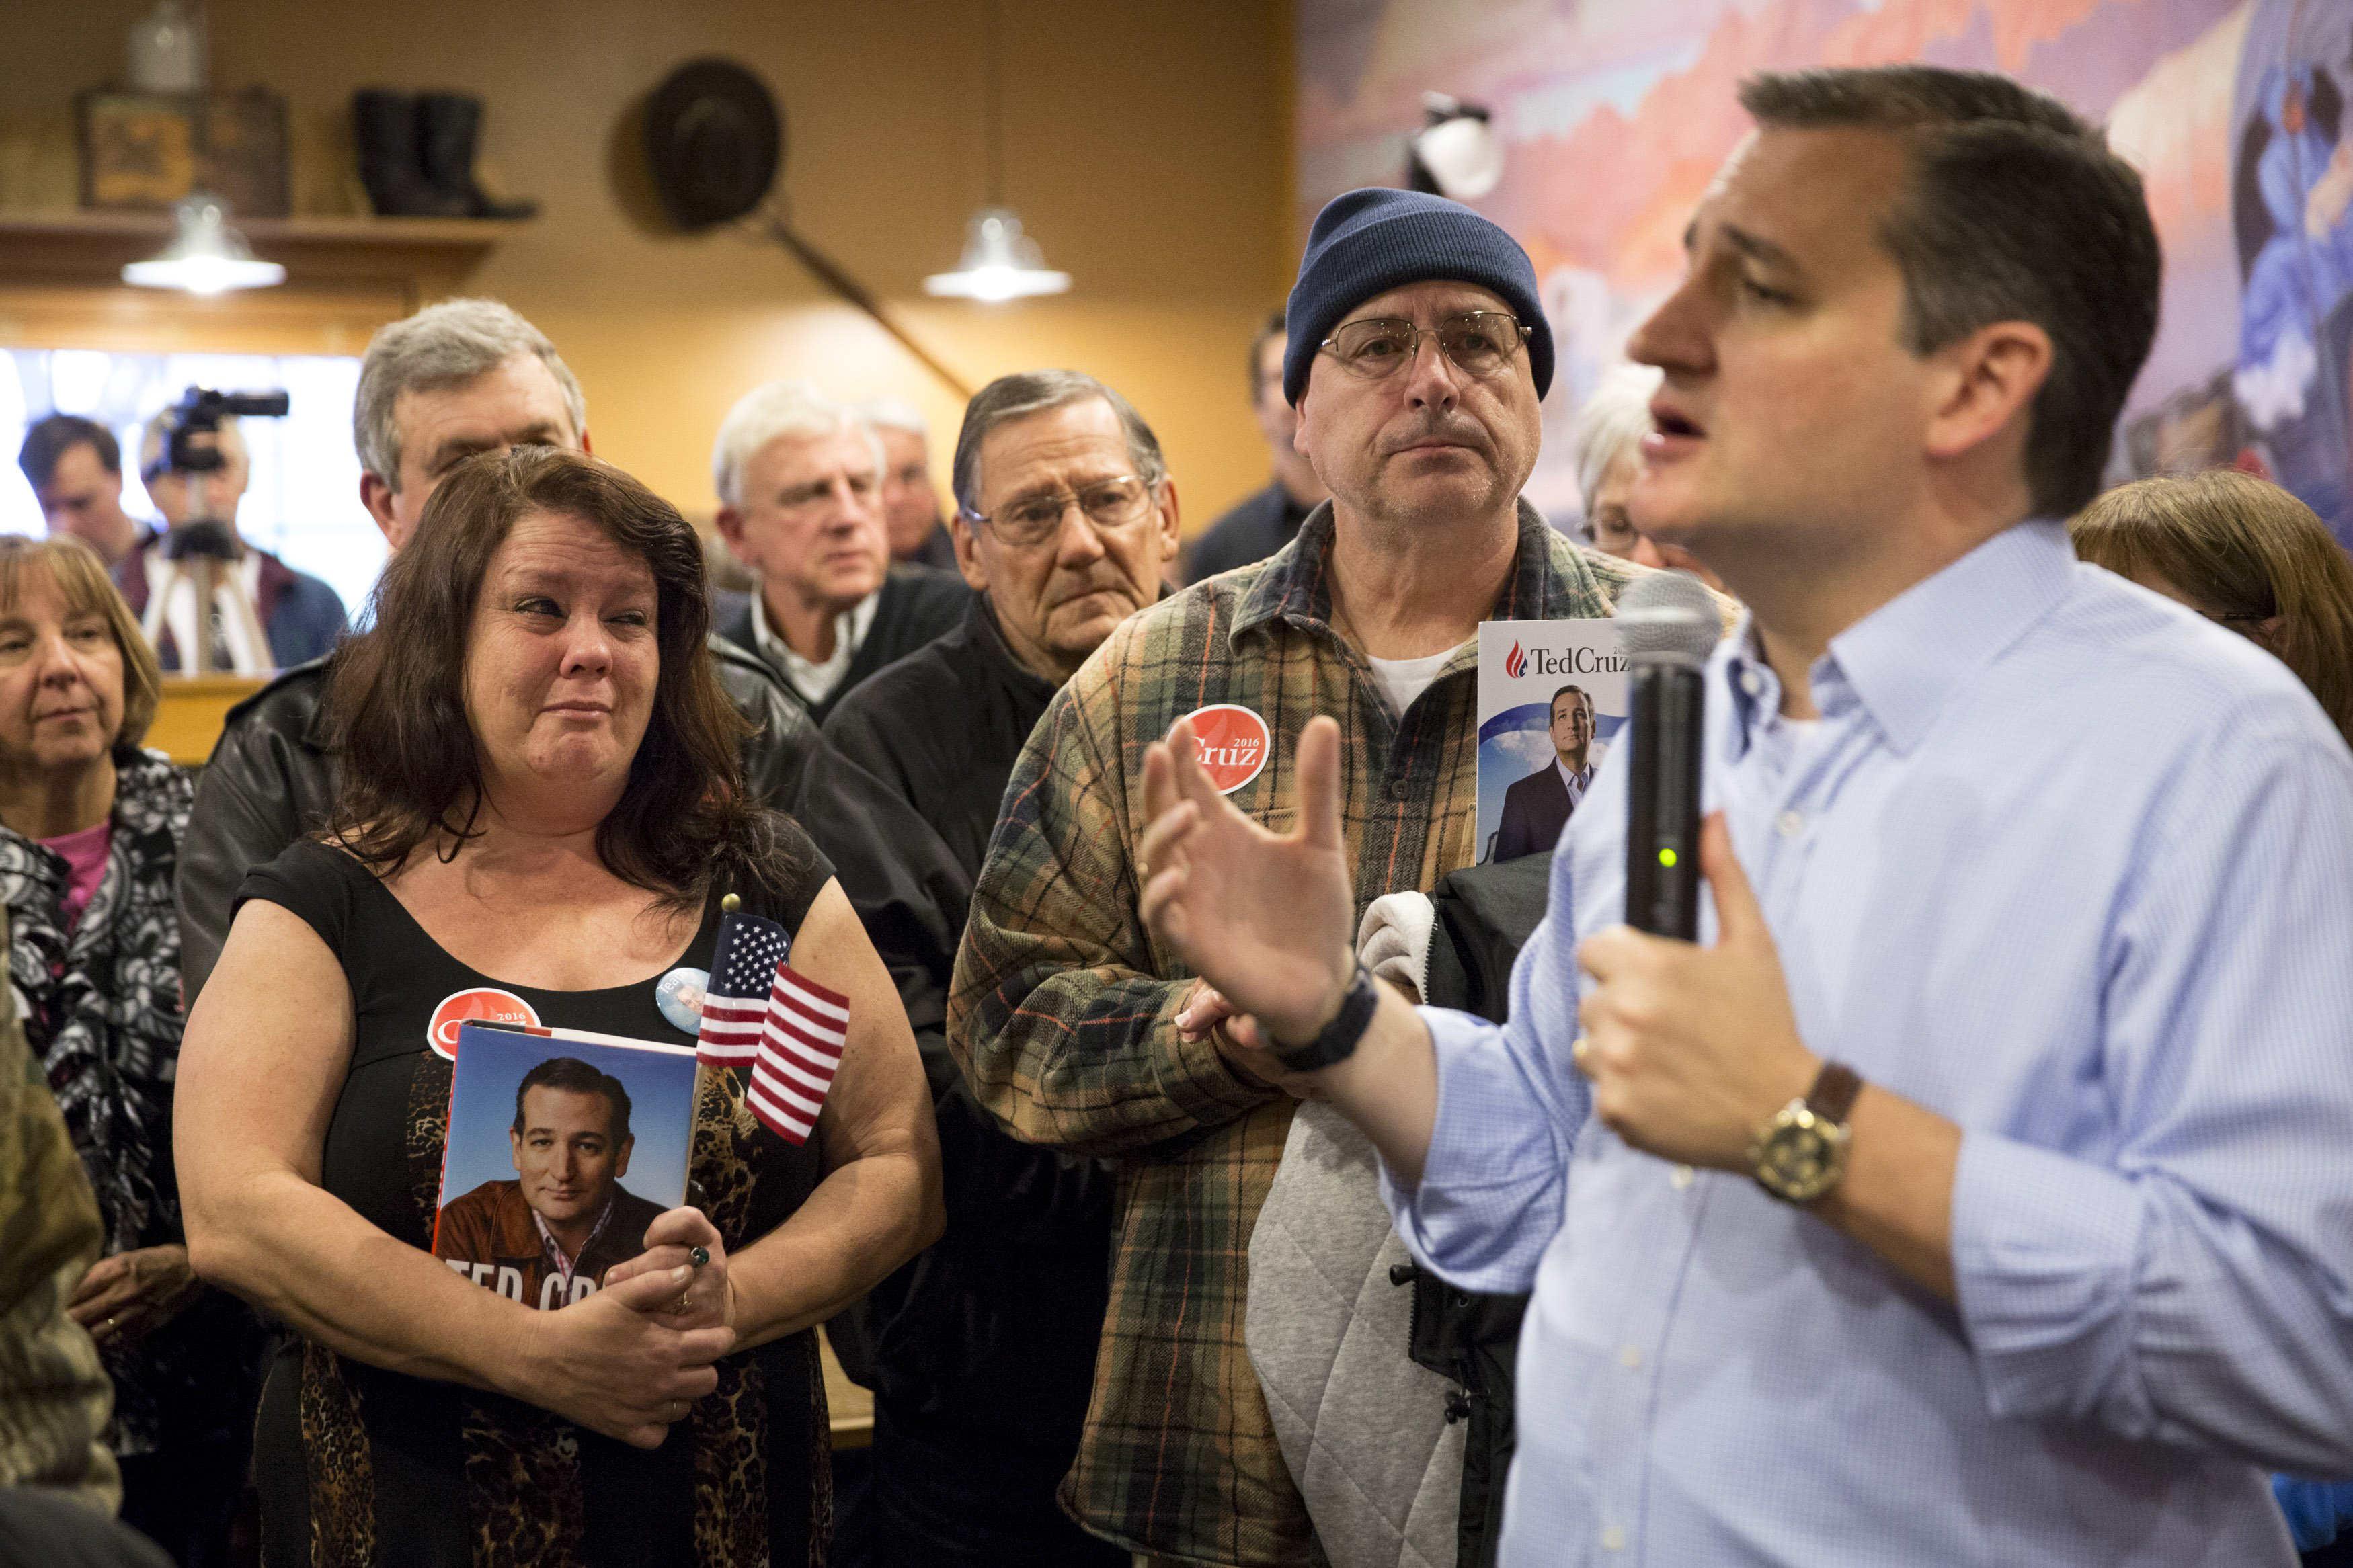 Grayson Wrongly Says Cruz Not An American Politifact